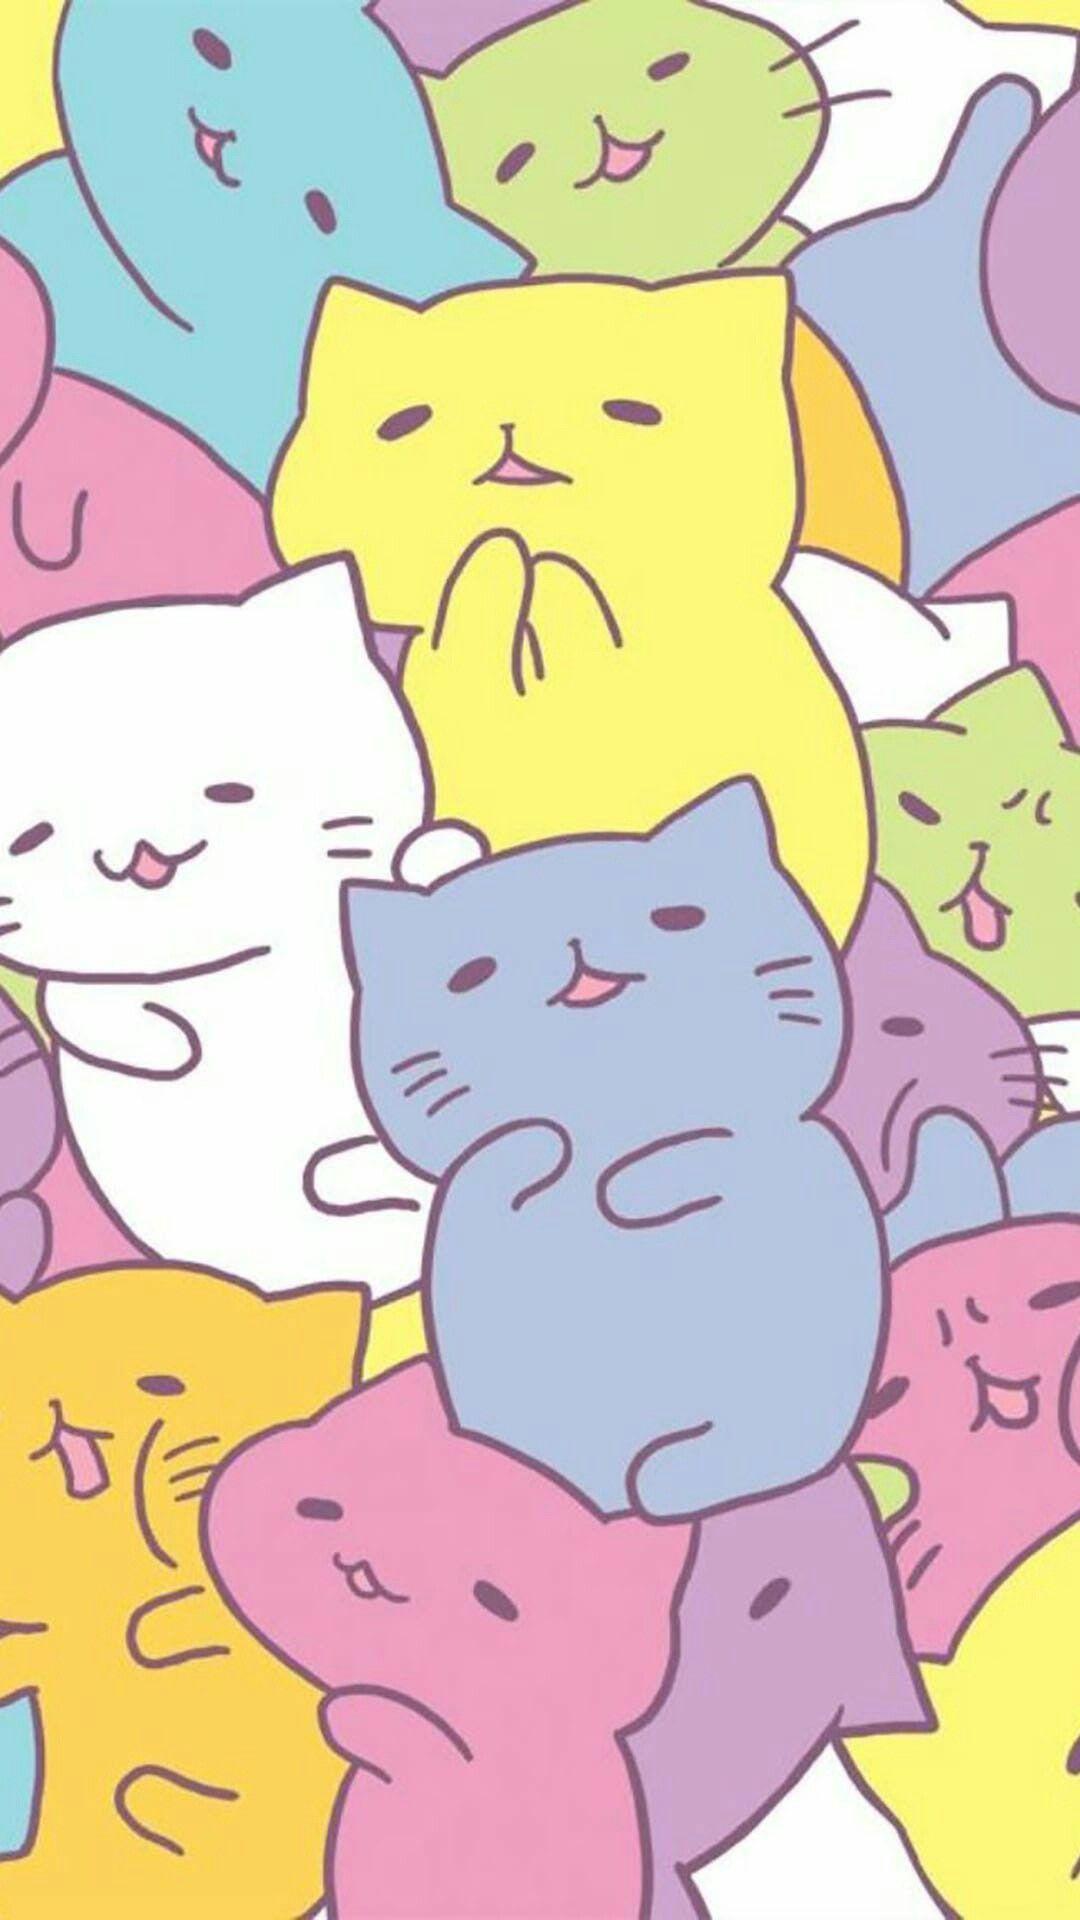 Kawaii Anime Cat Android, iPhone, Desktop HD Backgrounds